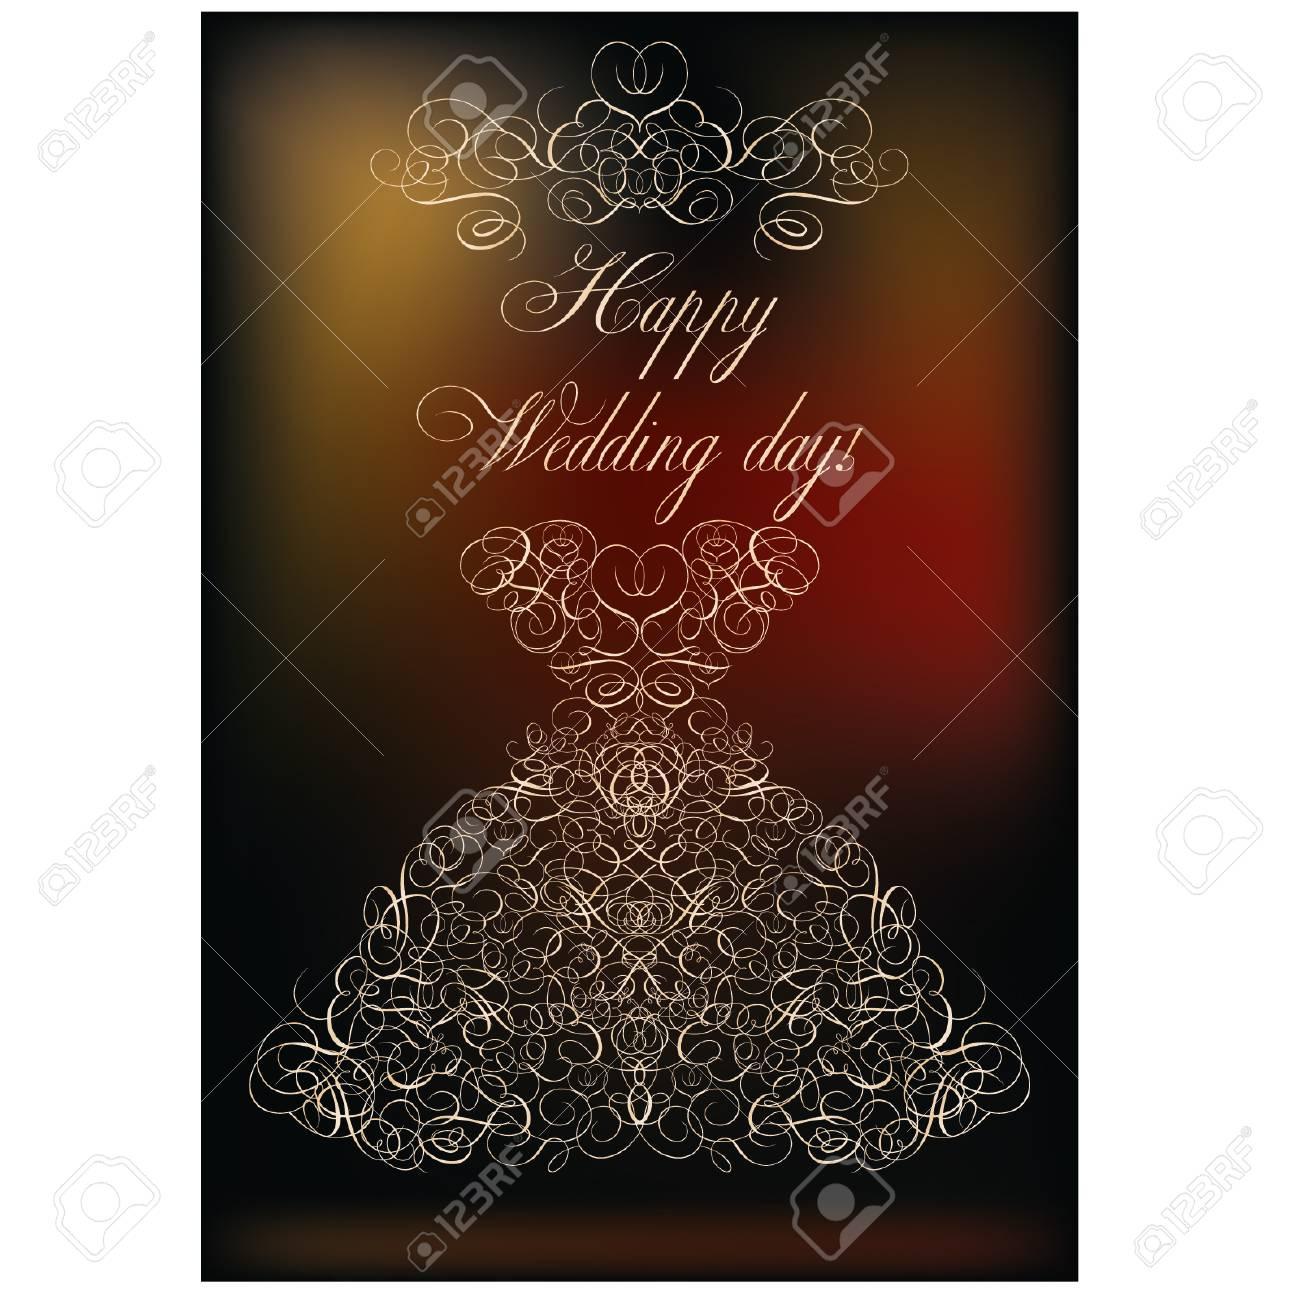 Happy Wedding Day Invitation Card, Vector Illustration Royalty Free ...